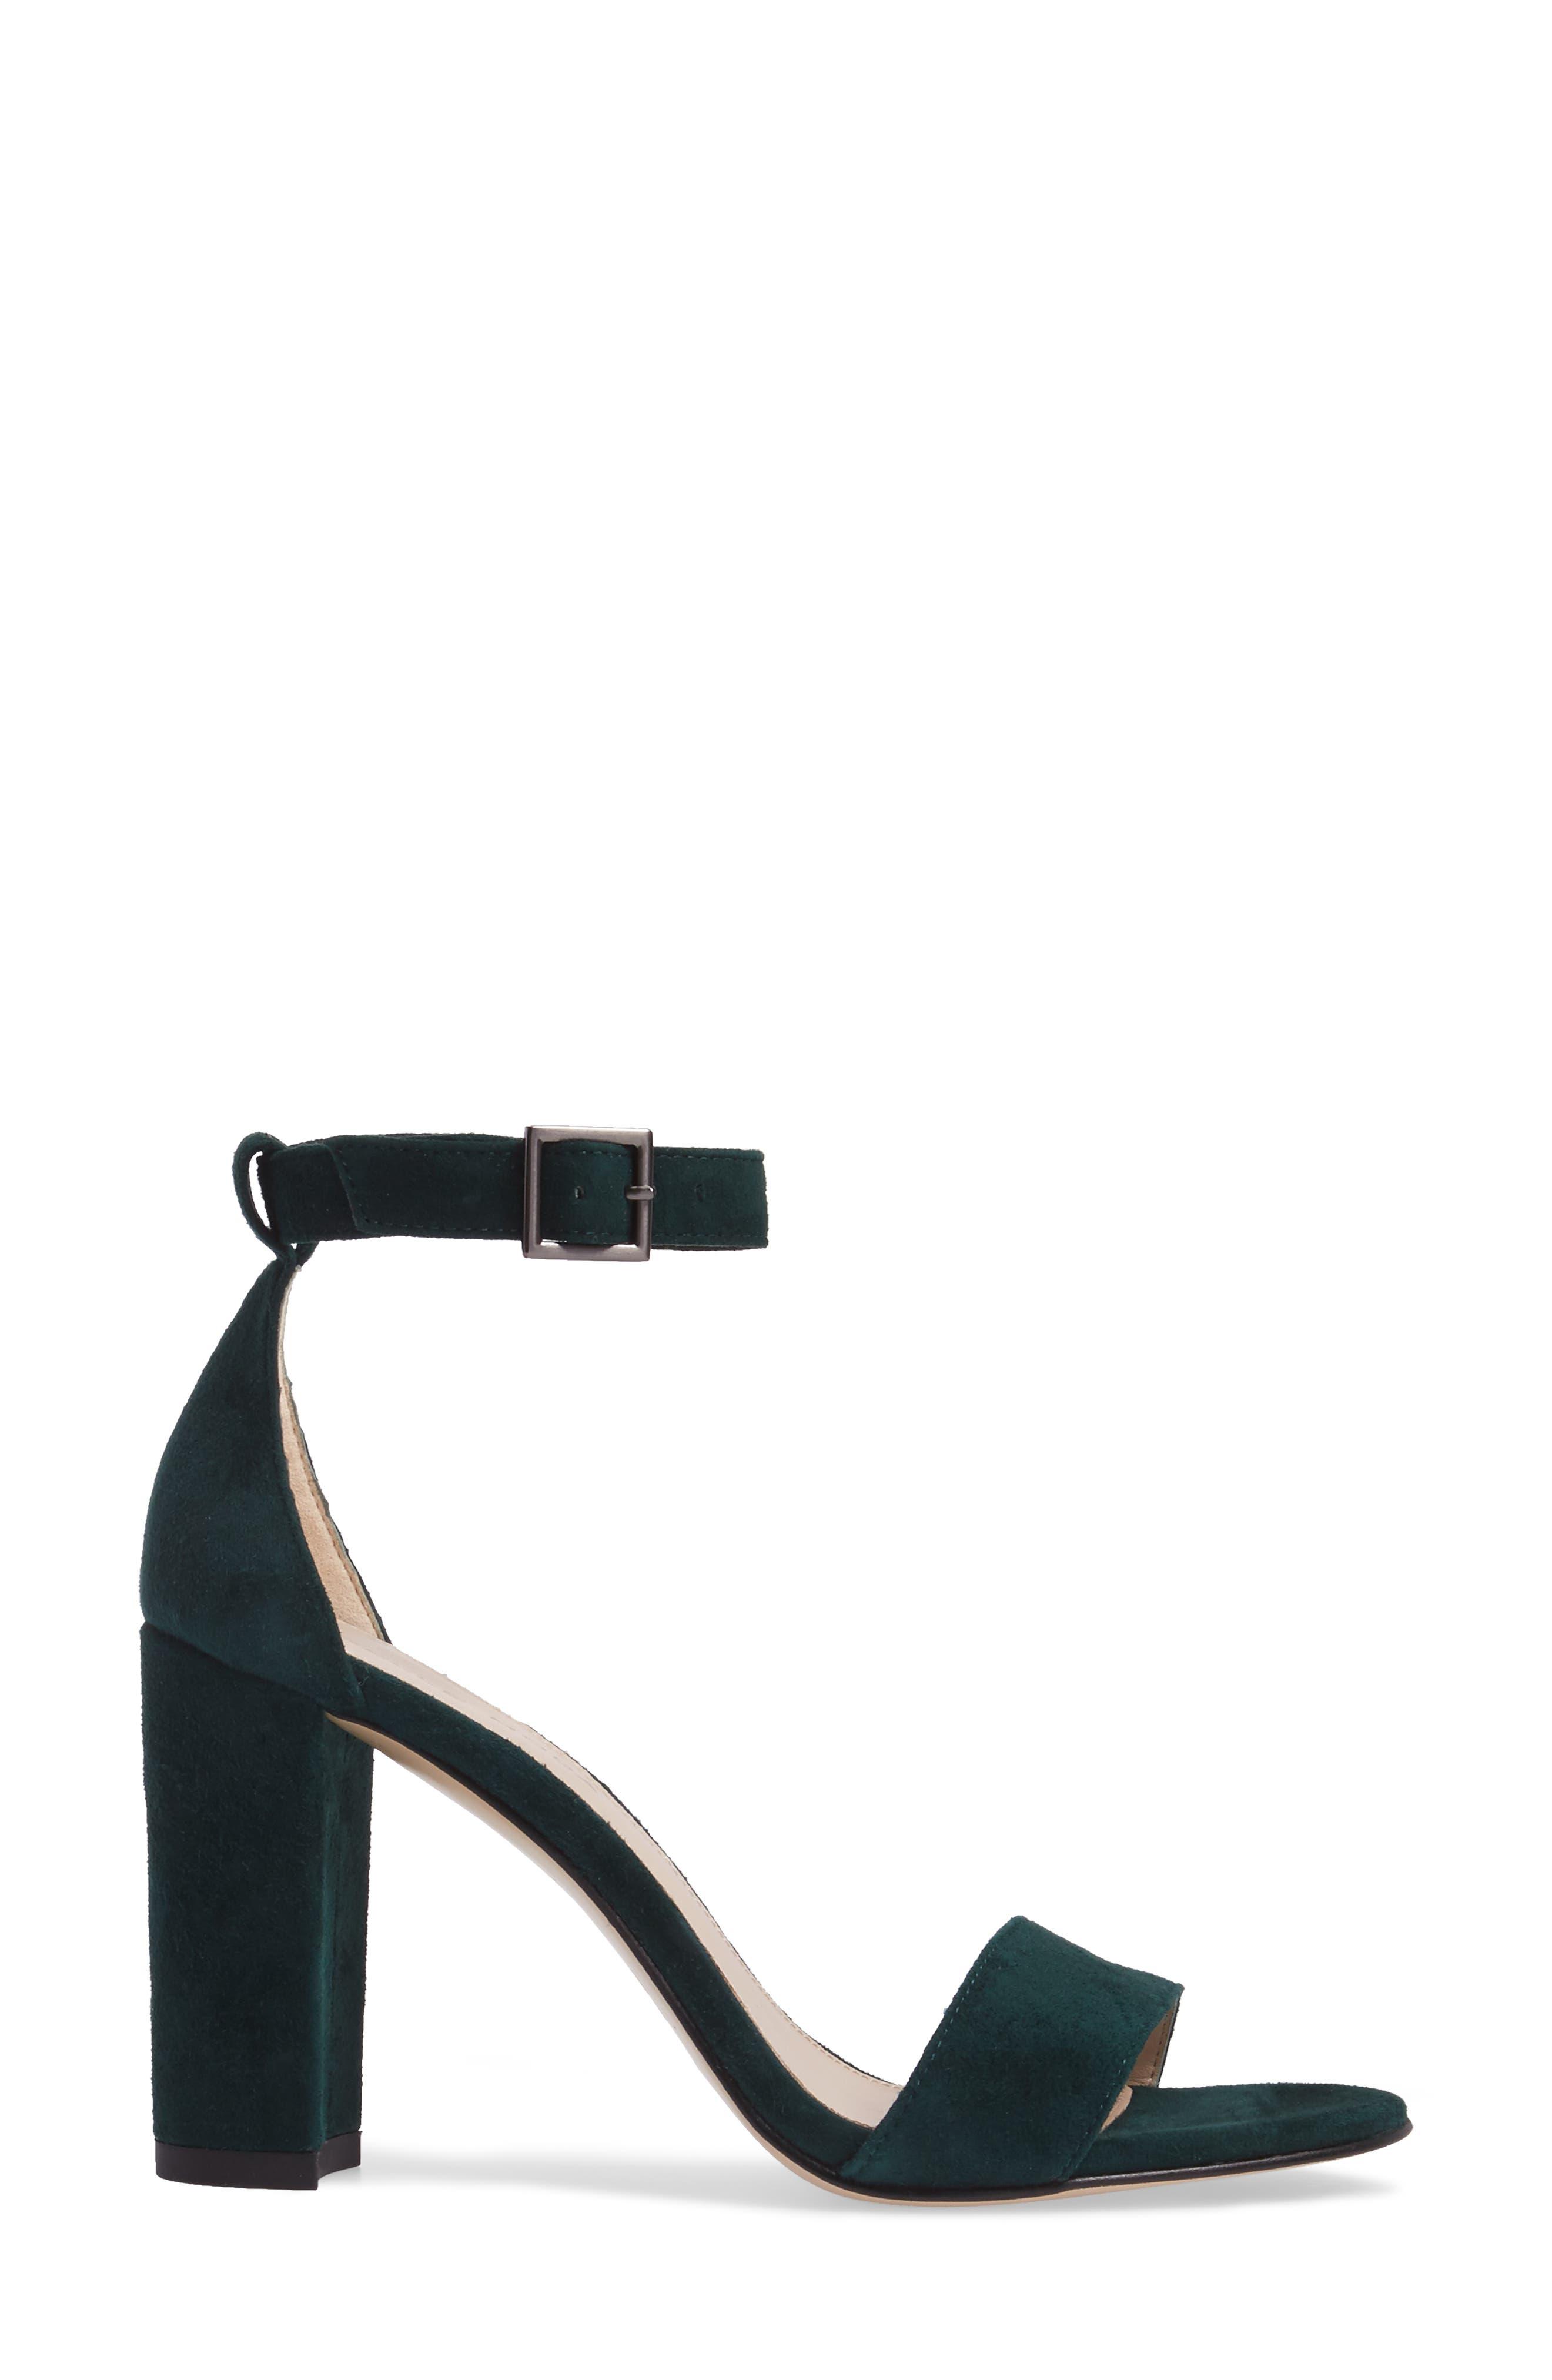 Bonnie Ankle Strap Sandal,                             Alternate thumbnail 3, color,                             Forest Leather